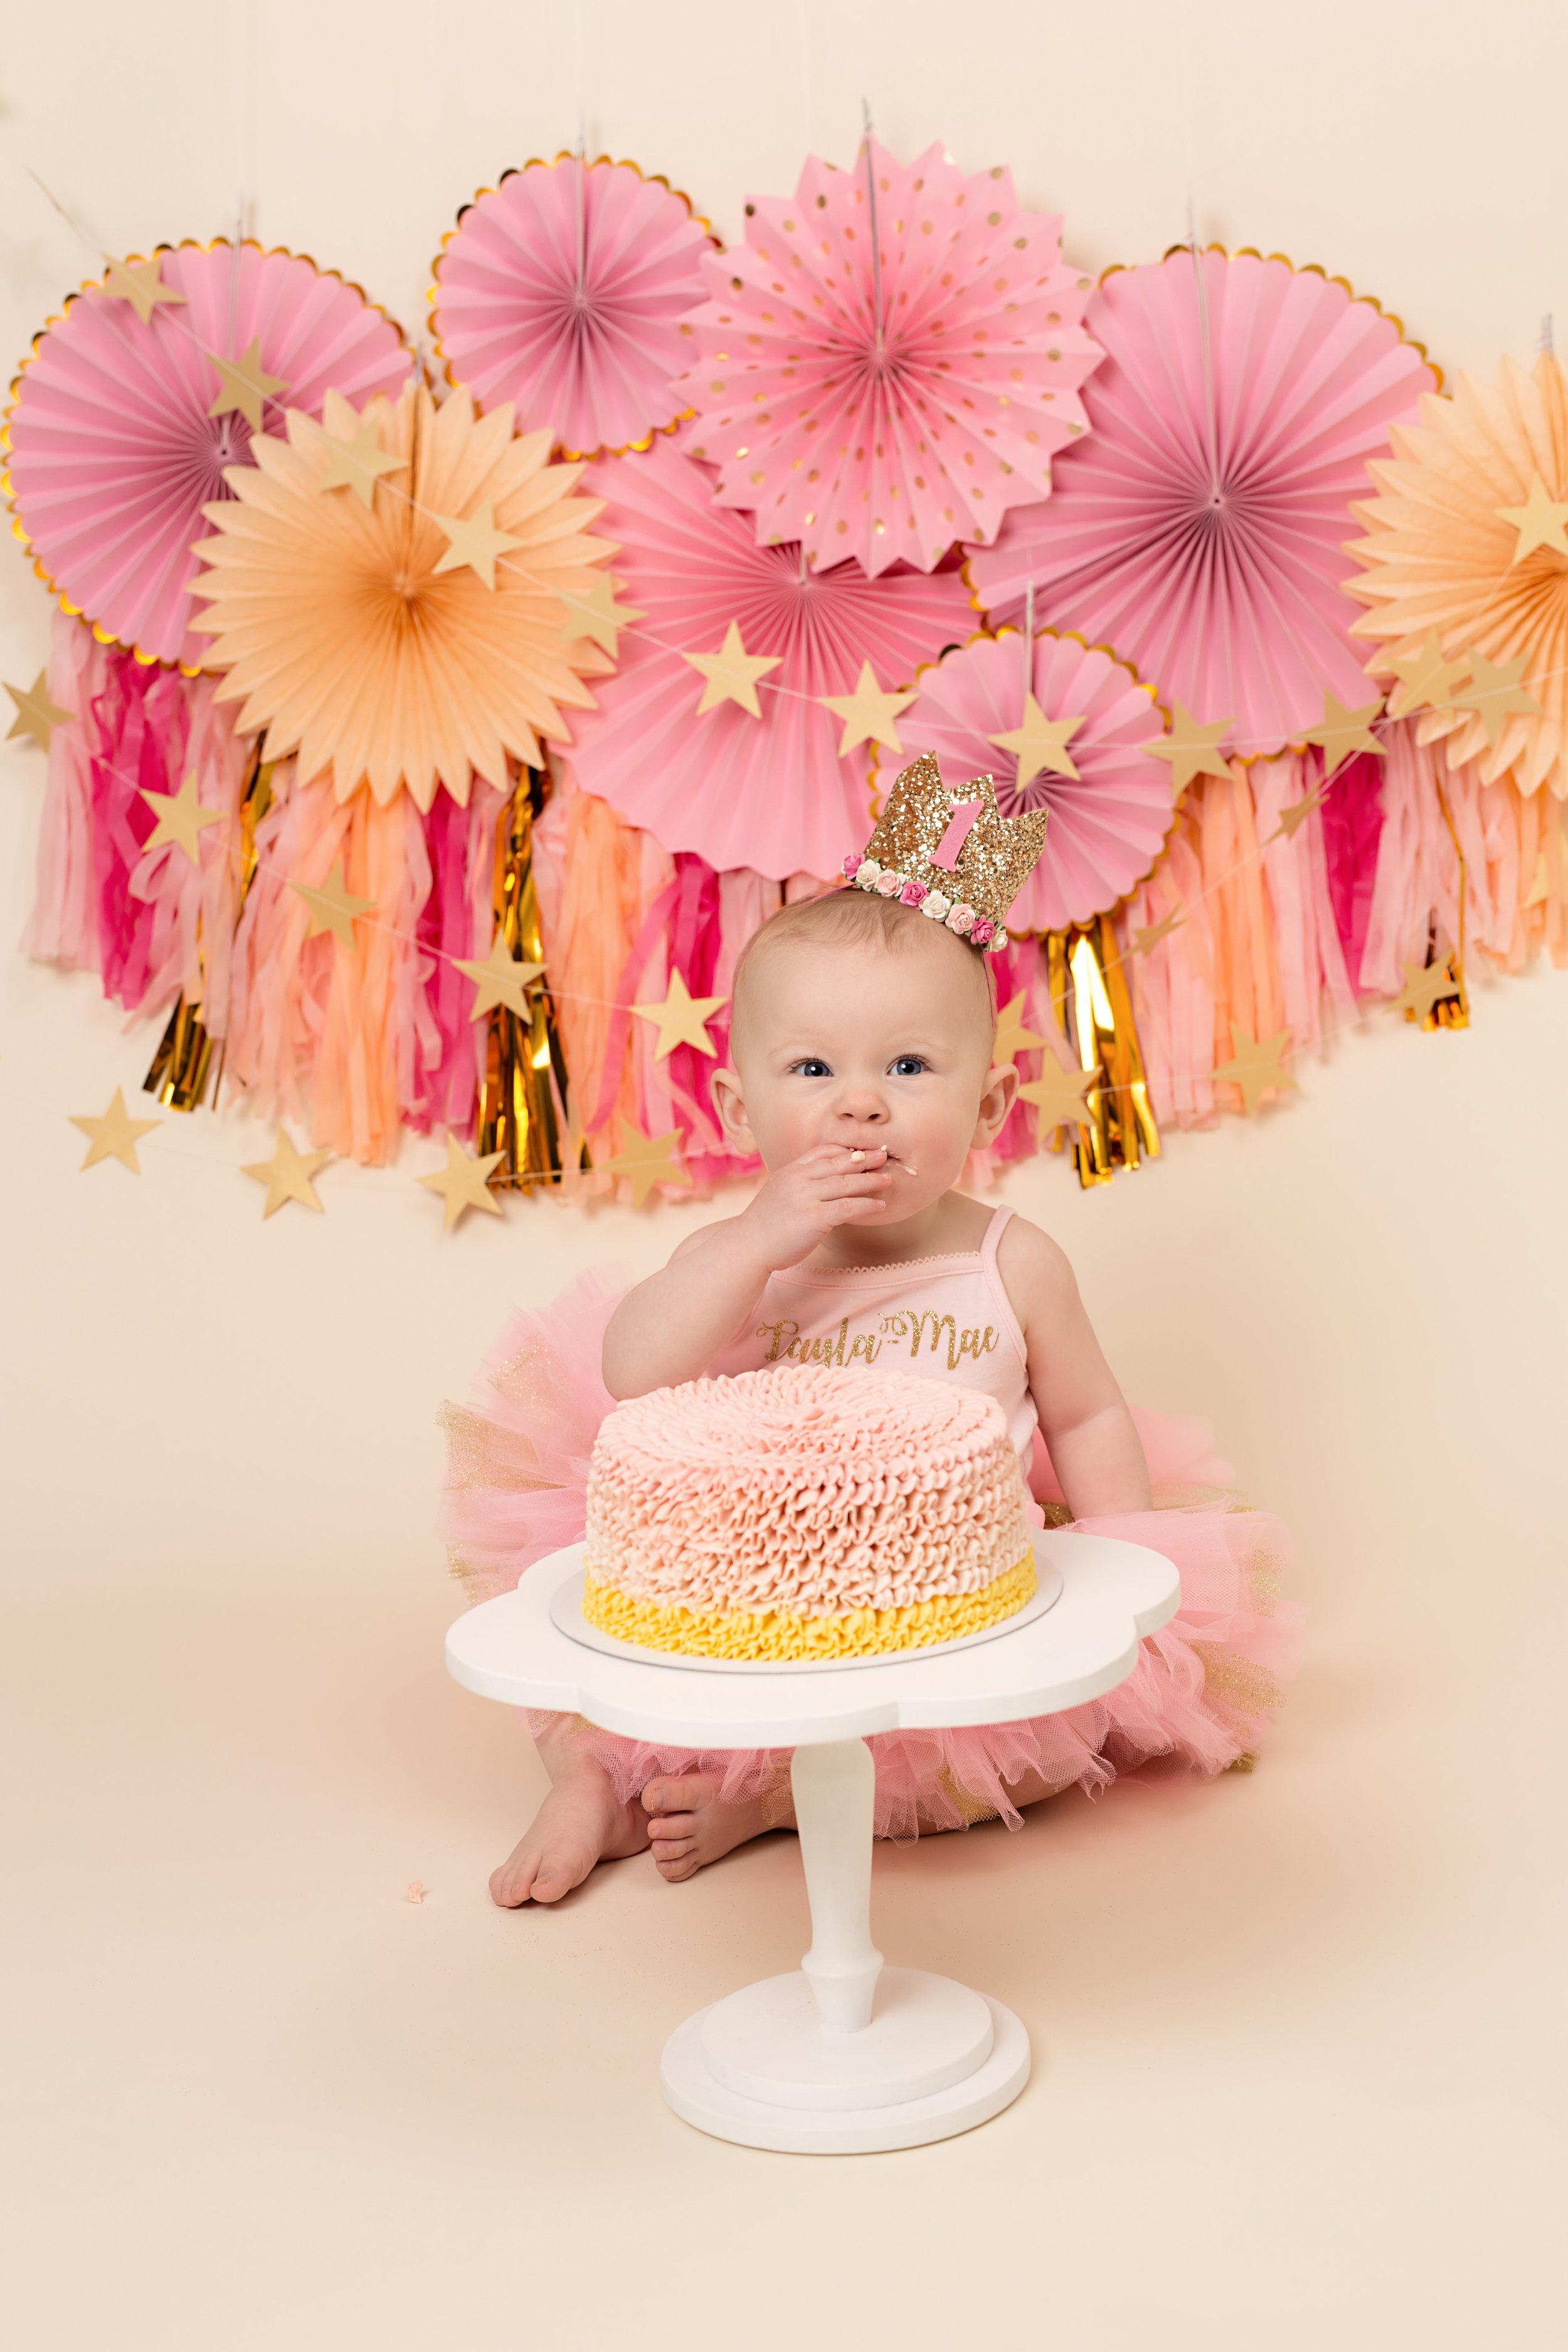 Karen Kimmins Photography. Cake smash sessions. _04.jpg